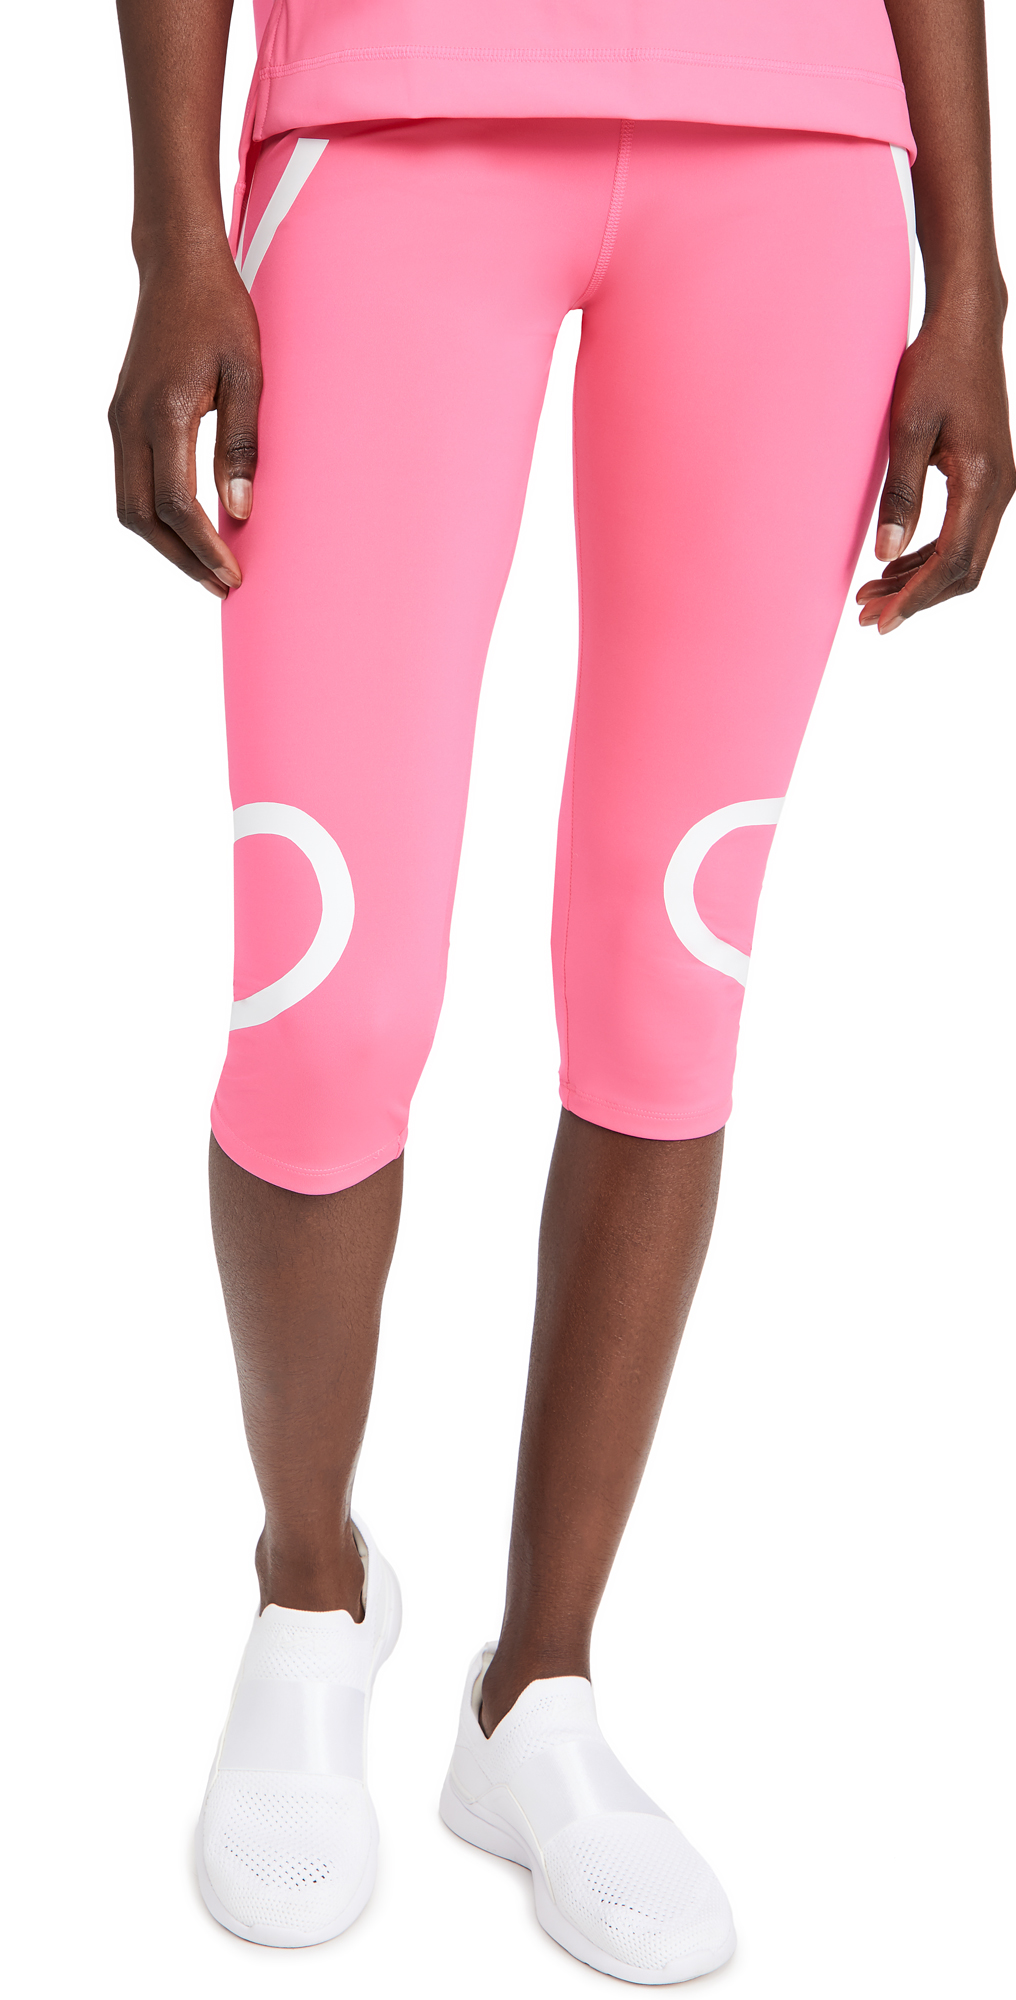 adidas by Stella McCartney TruePurpose 3/4 Tights